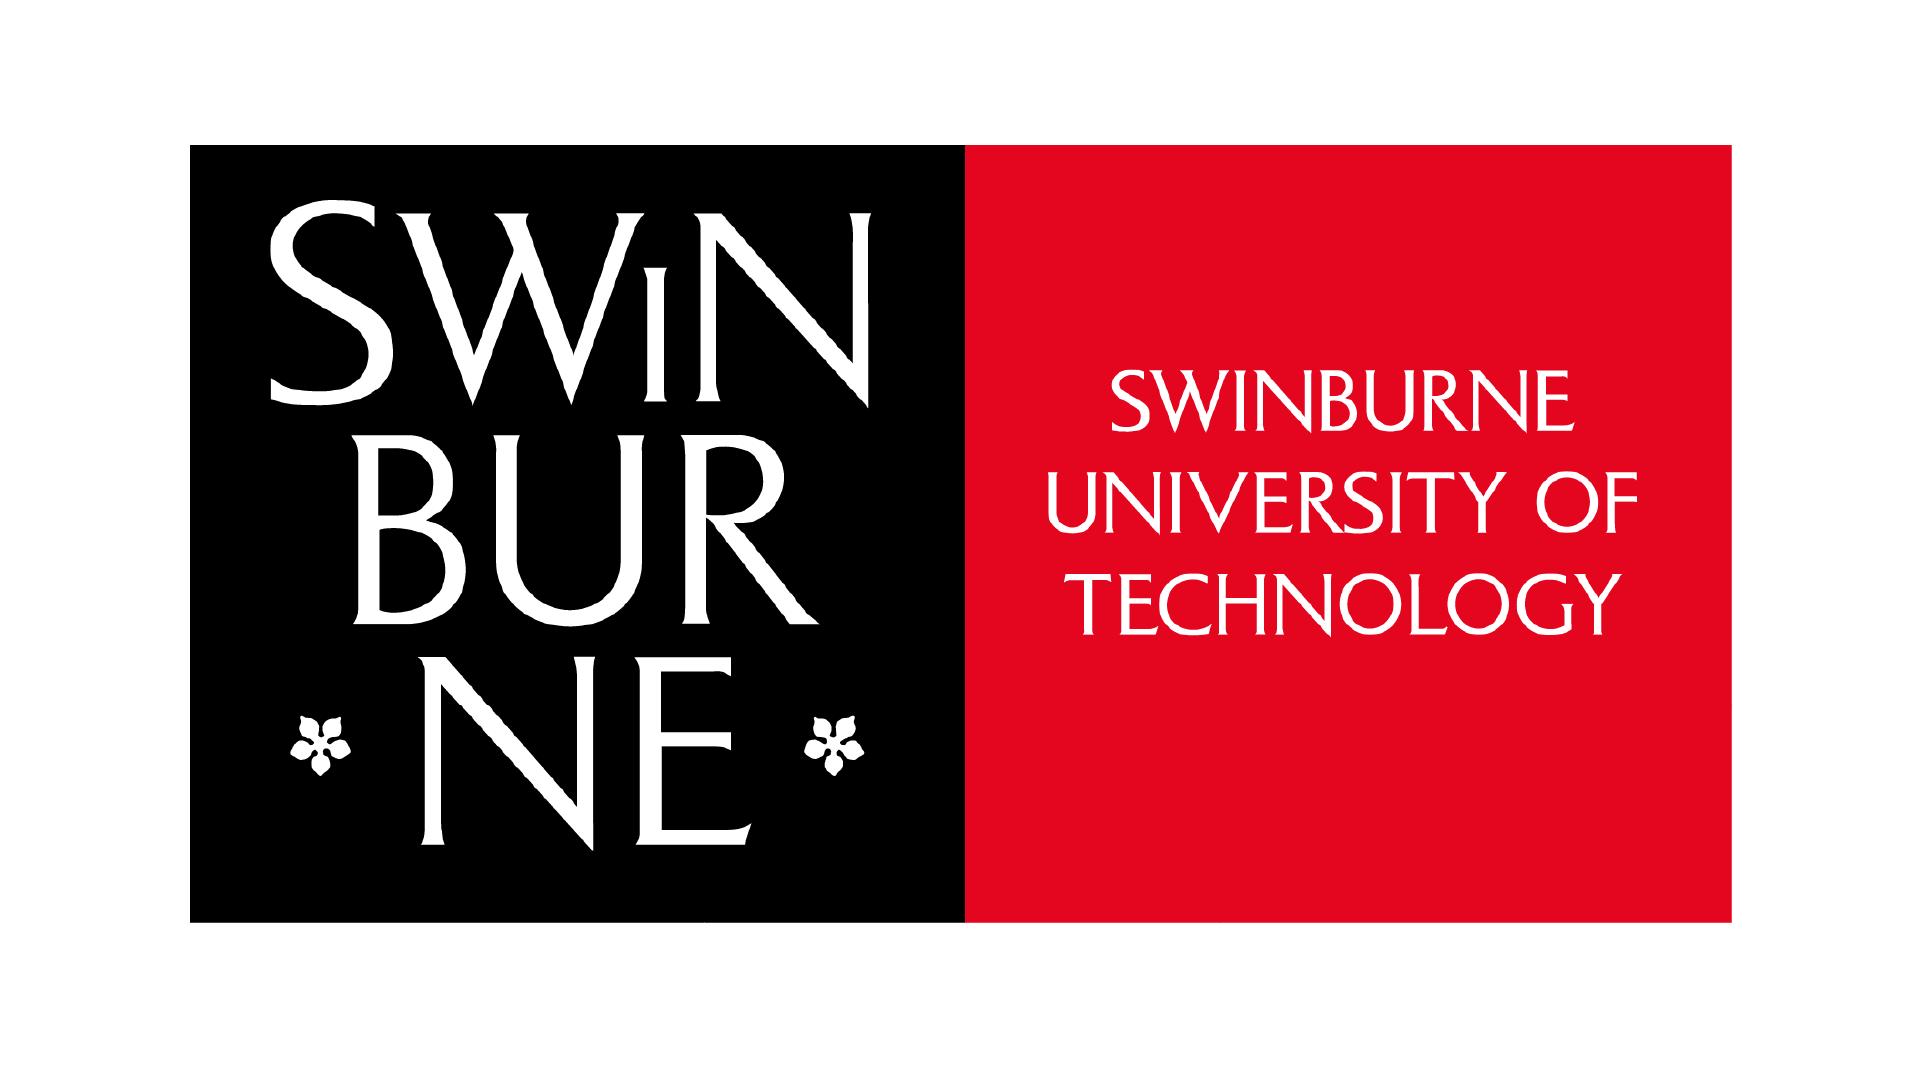 Swinburne-University-of-Technology.png